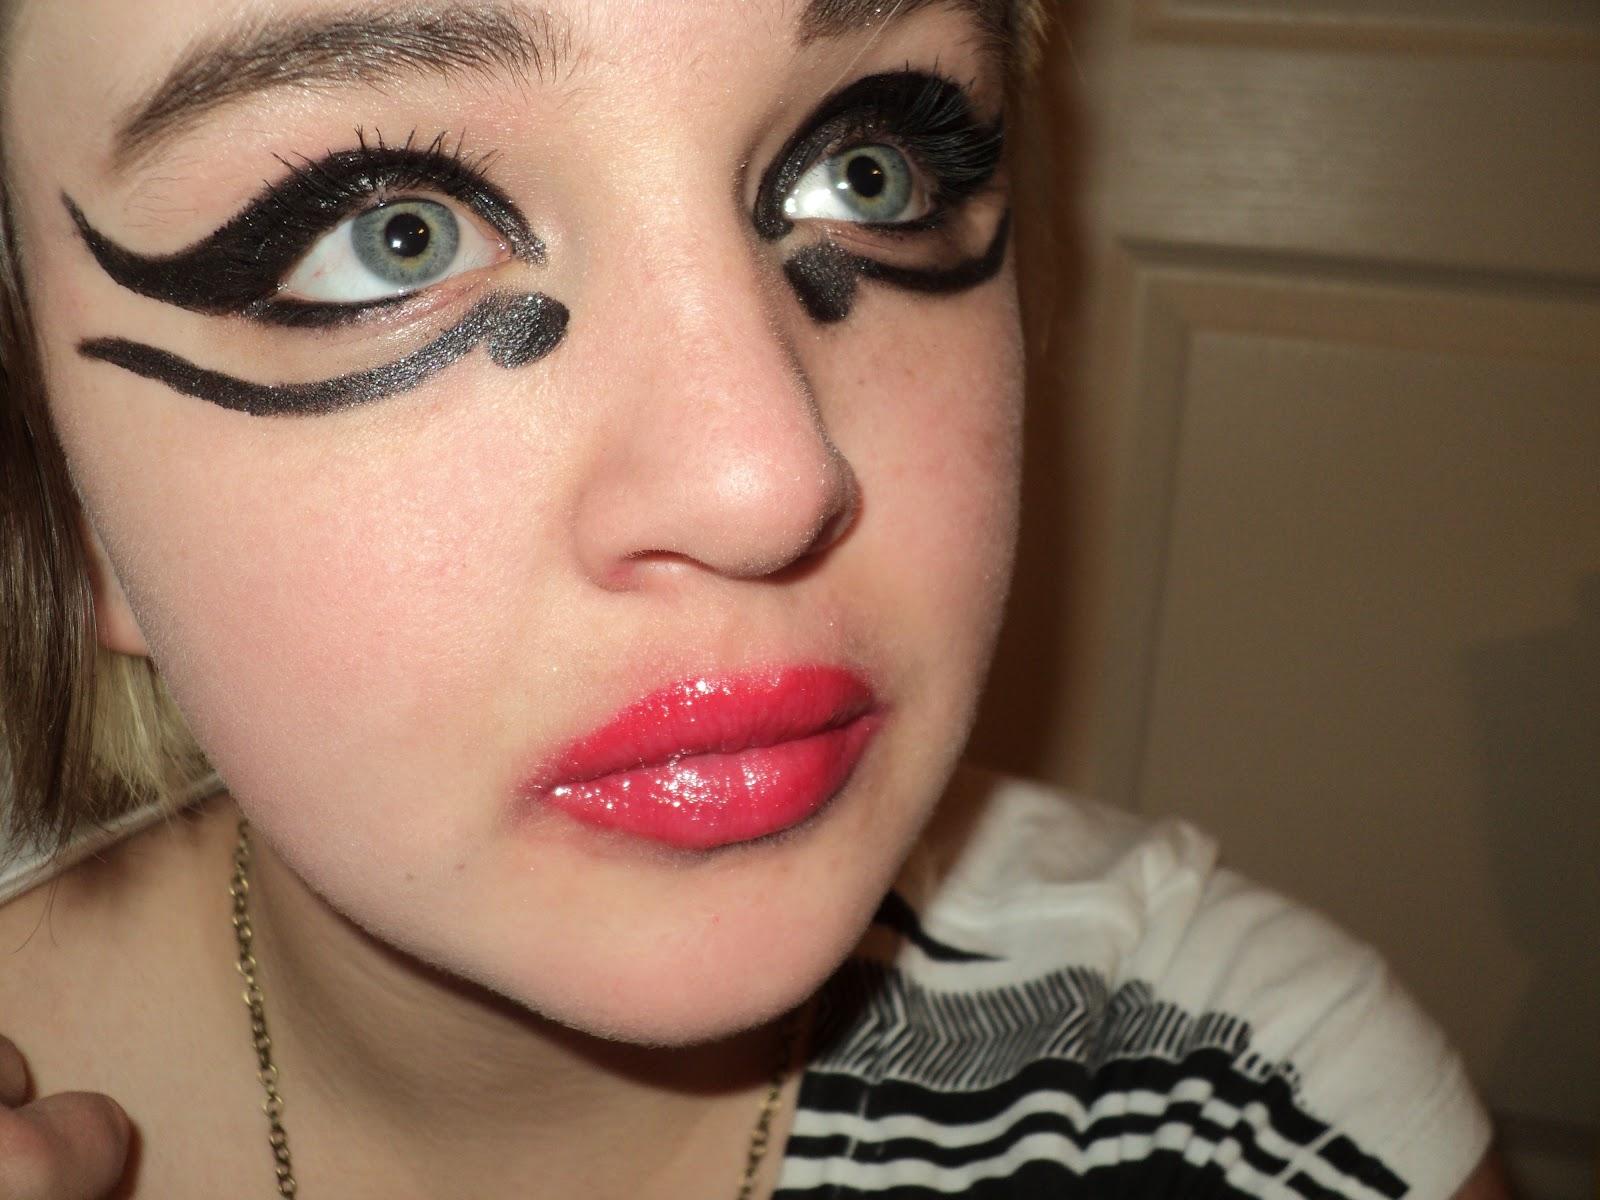 Eye Of Horus Makeup - Mugeek Vidalondon